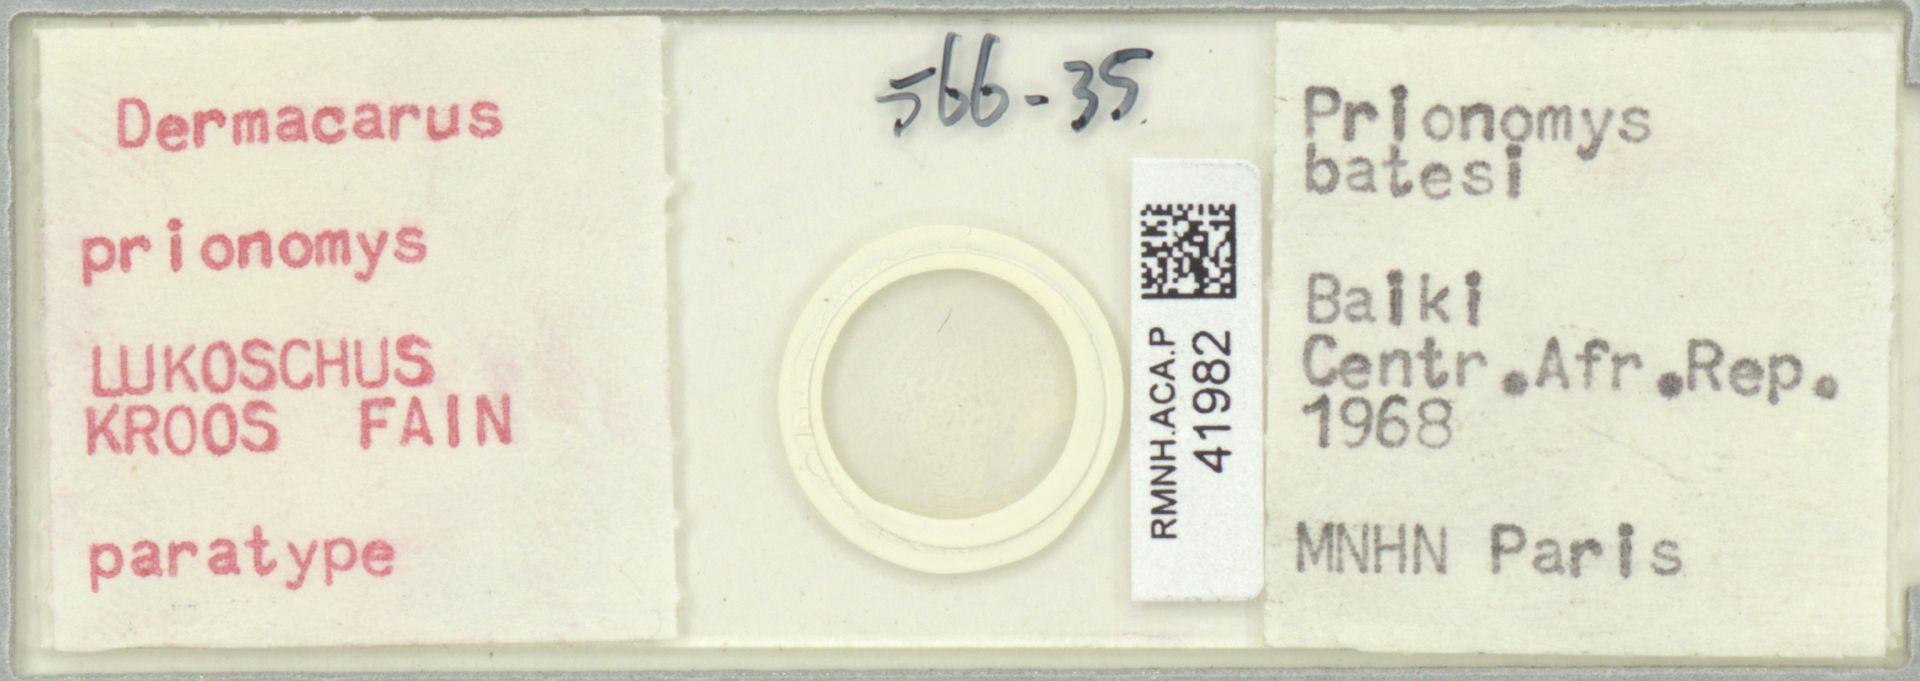 RMNH.ACA.P.41982 | Dermacarus prionomys Lukoschus, Kroos, Fain